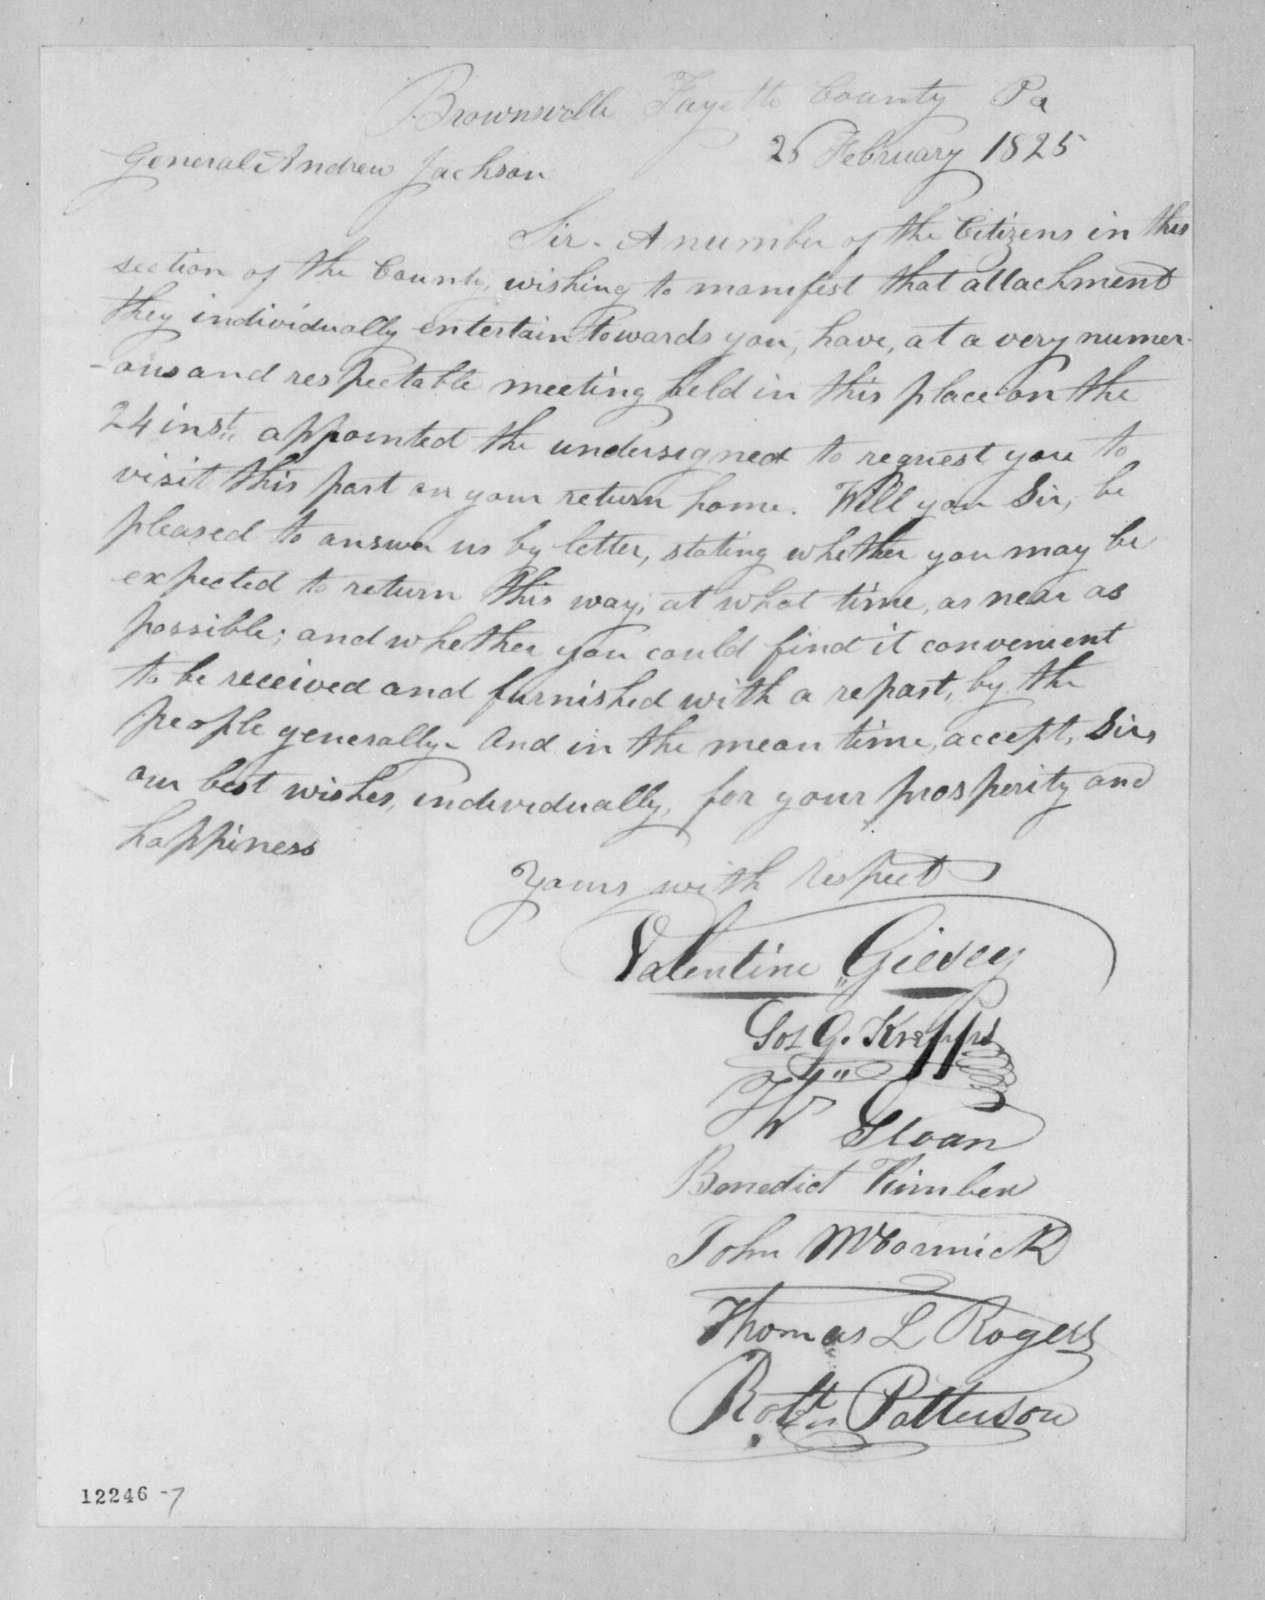 Valentine Giesey et al. to Andrew Jackson, February 26, 1825